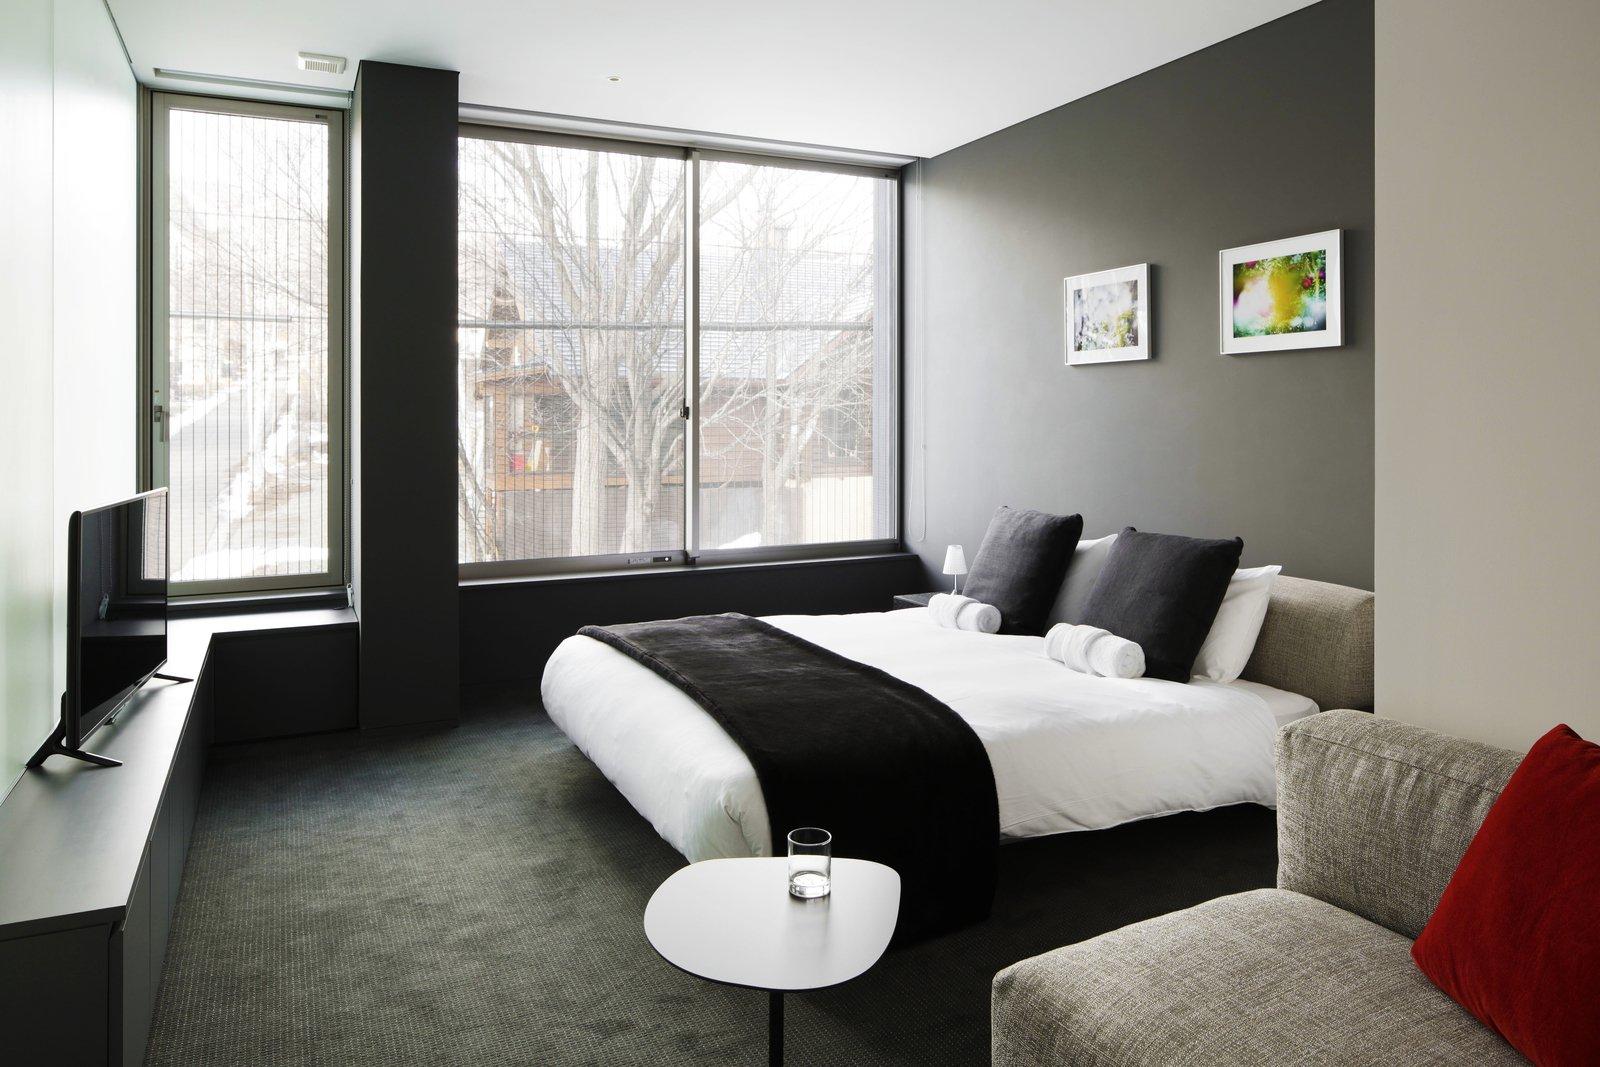 Terrazze 302 yotei master bedroom large